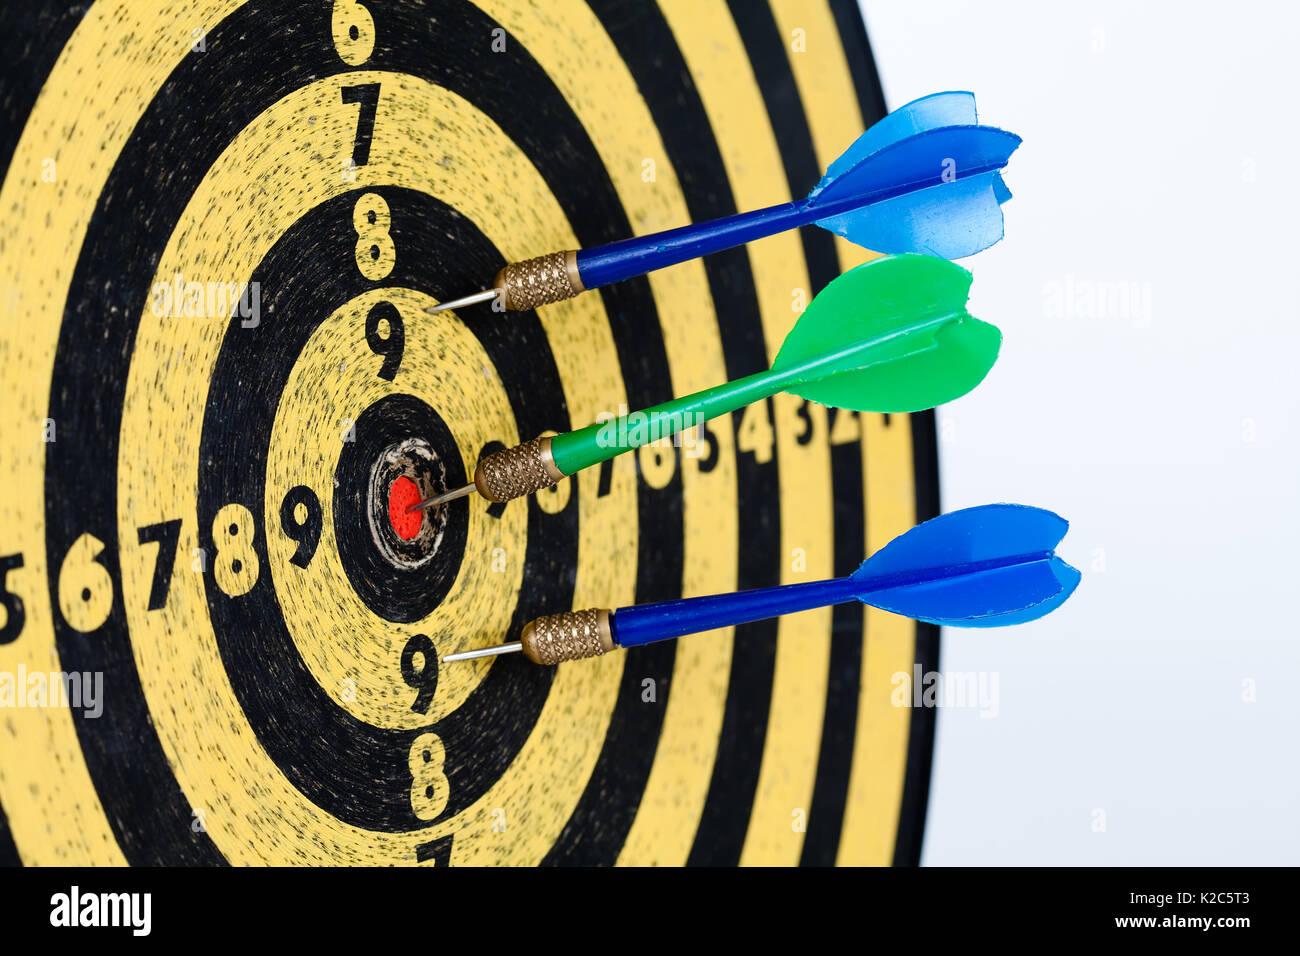 Retro style target darts on white background. success aim, goal concept. - Stock Image